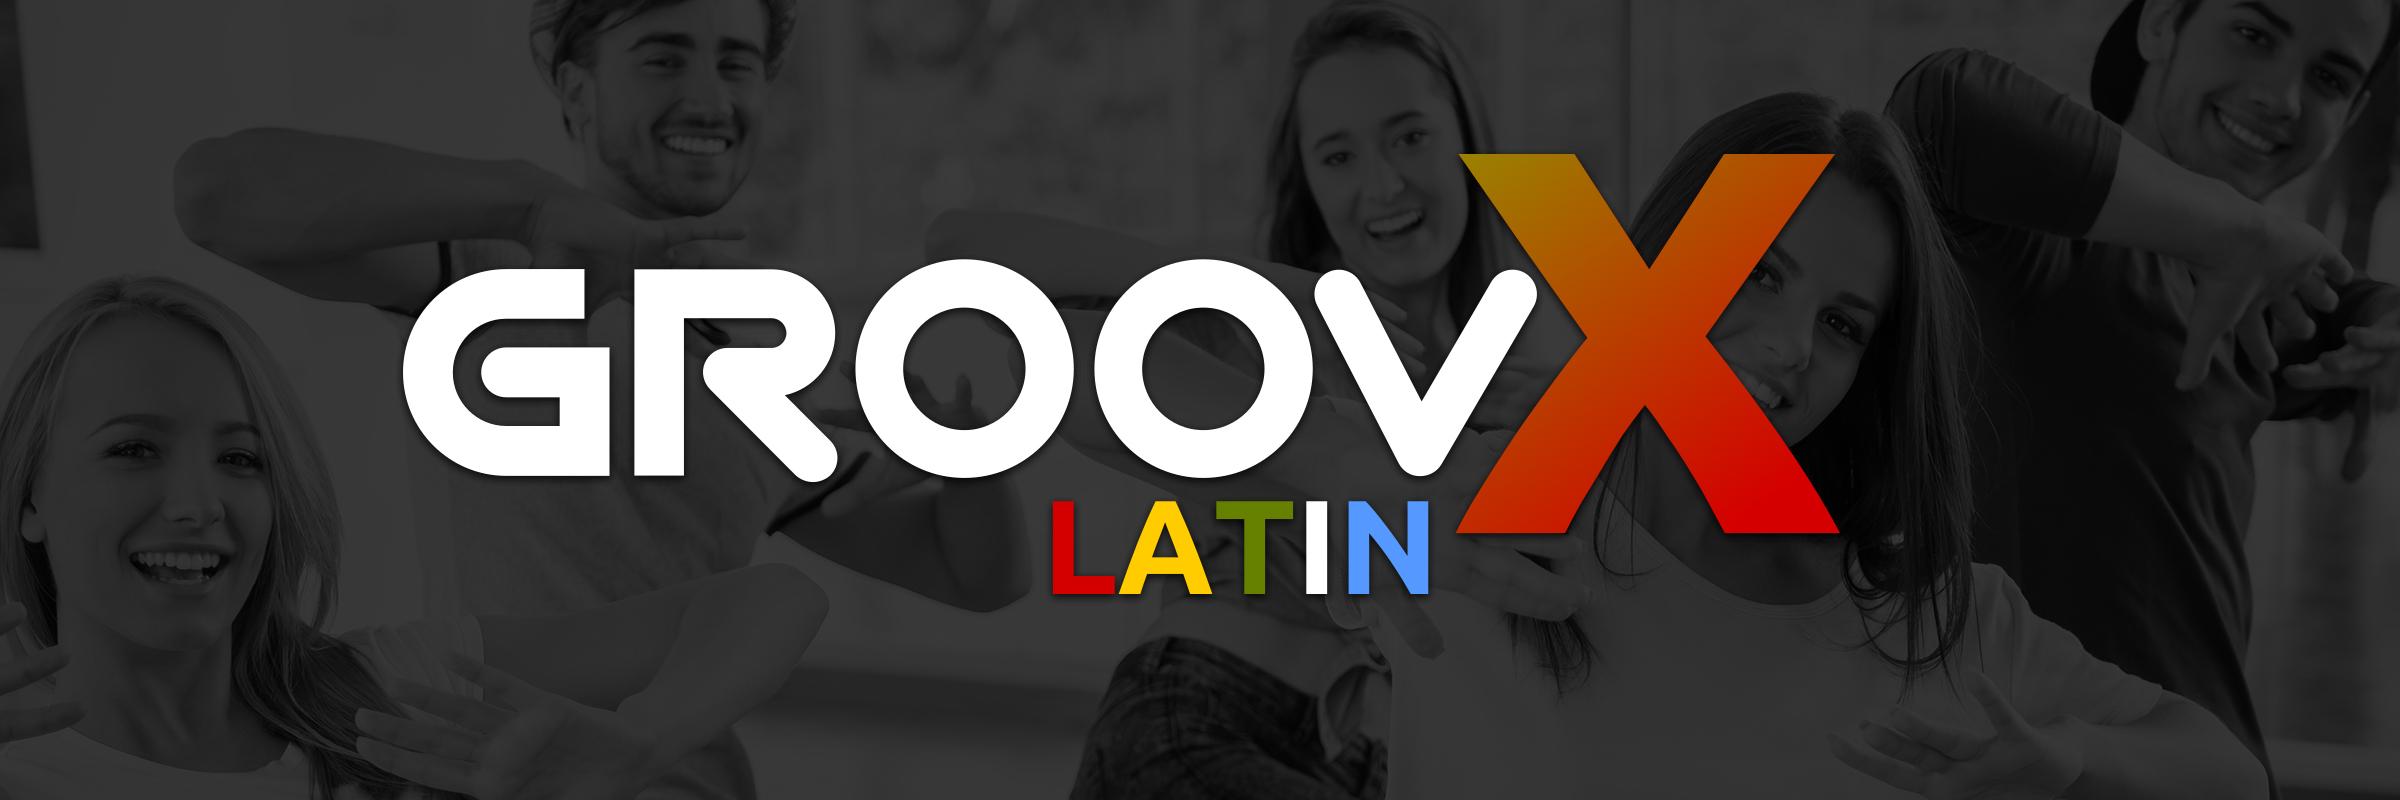 GroovX Latin